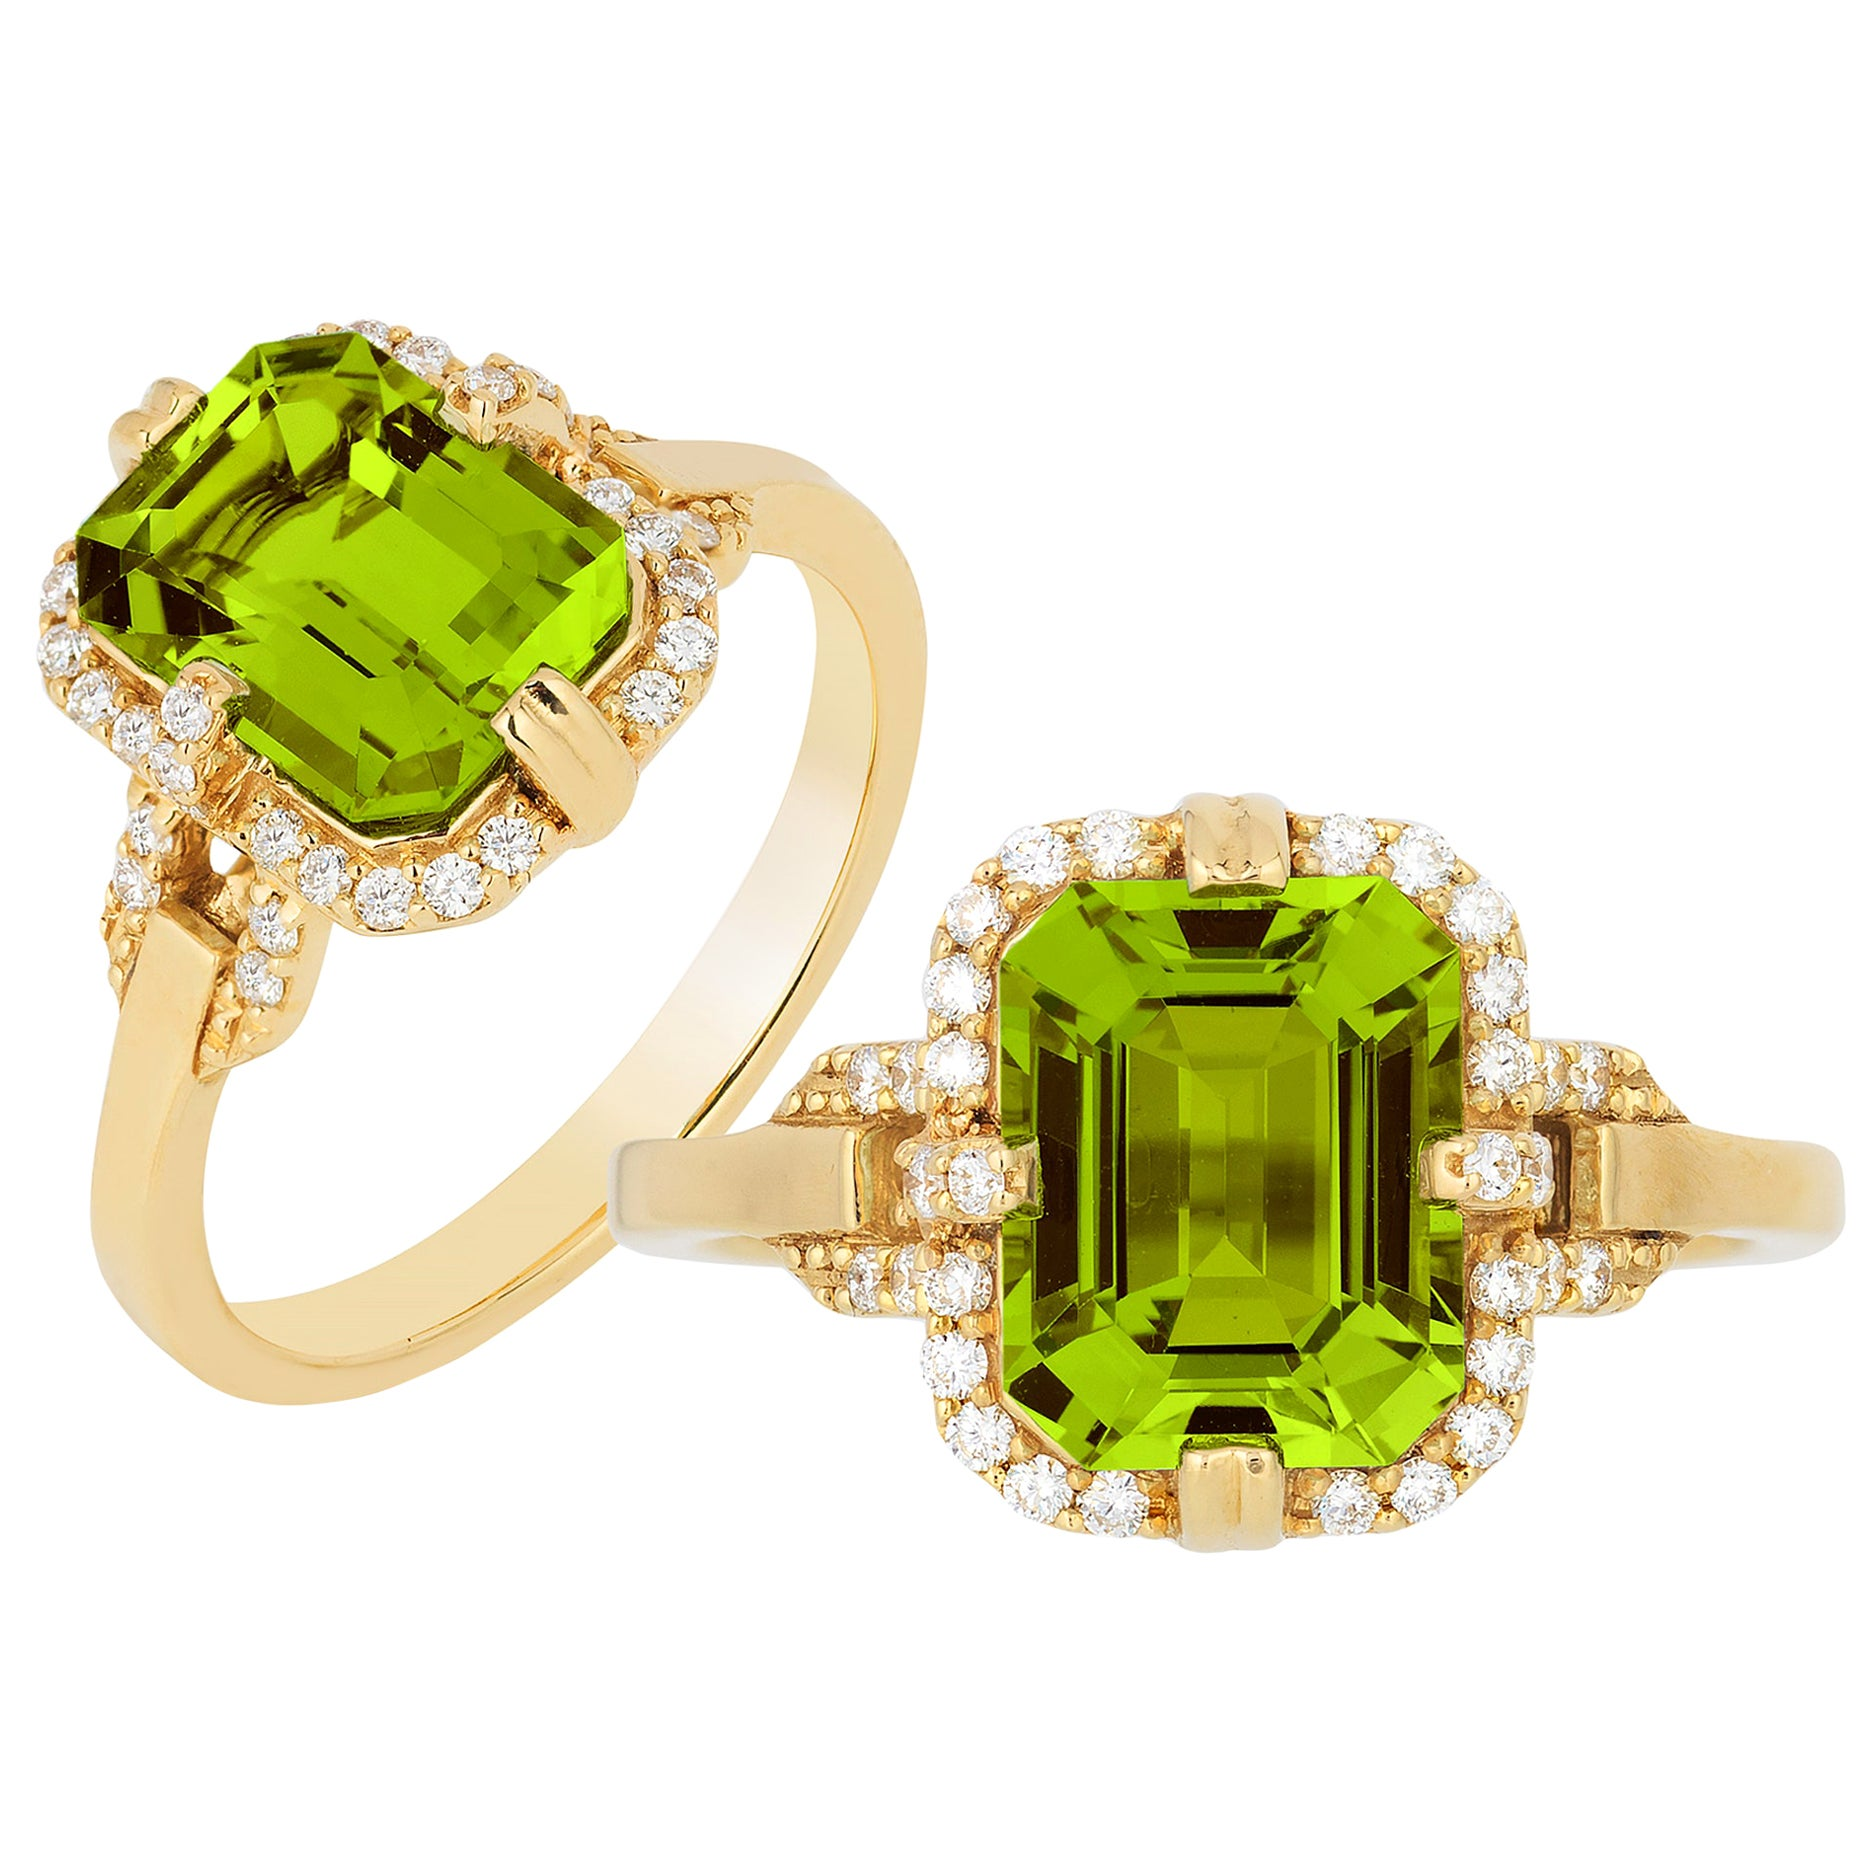 Goshwara Emerald Cut Peridot And Diamond Ring